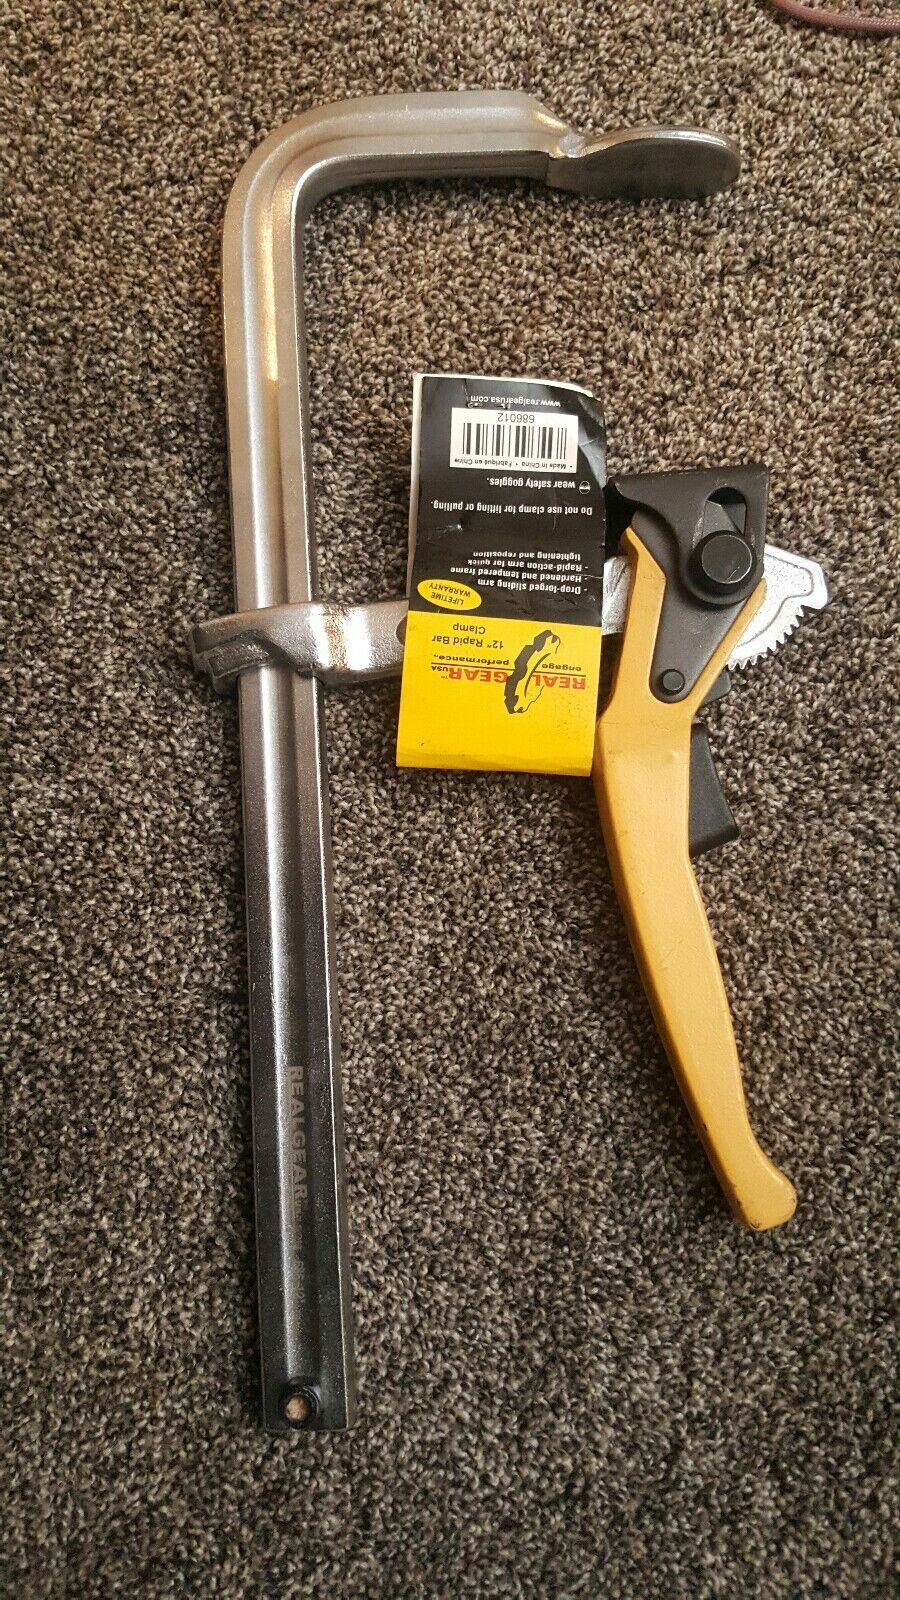 Real Gear 12  rapid bar clamp. Bx67